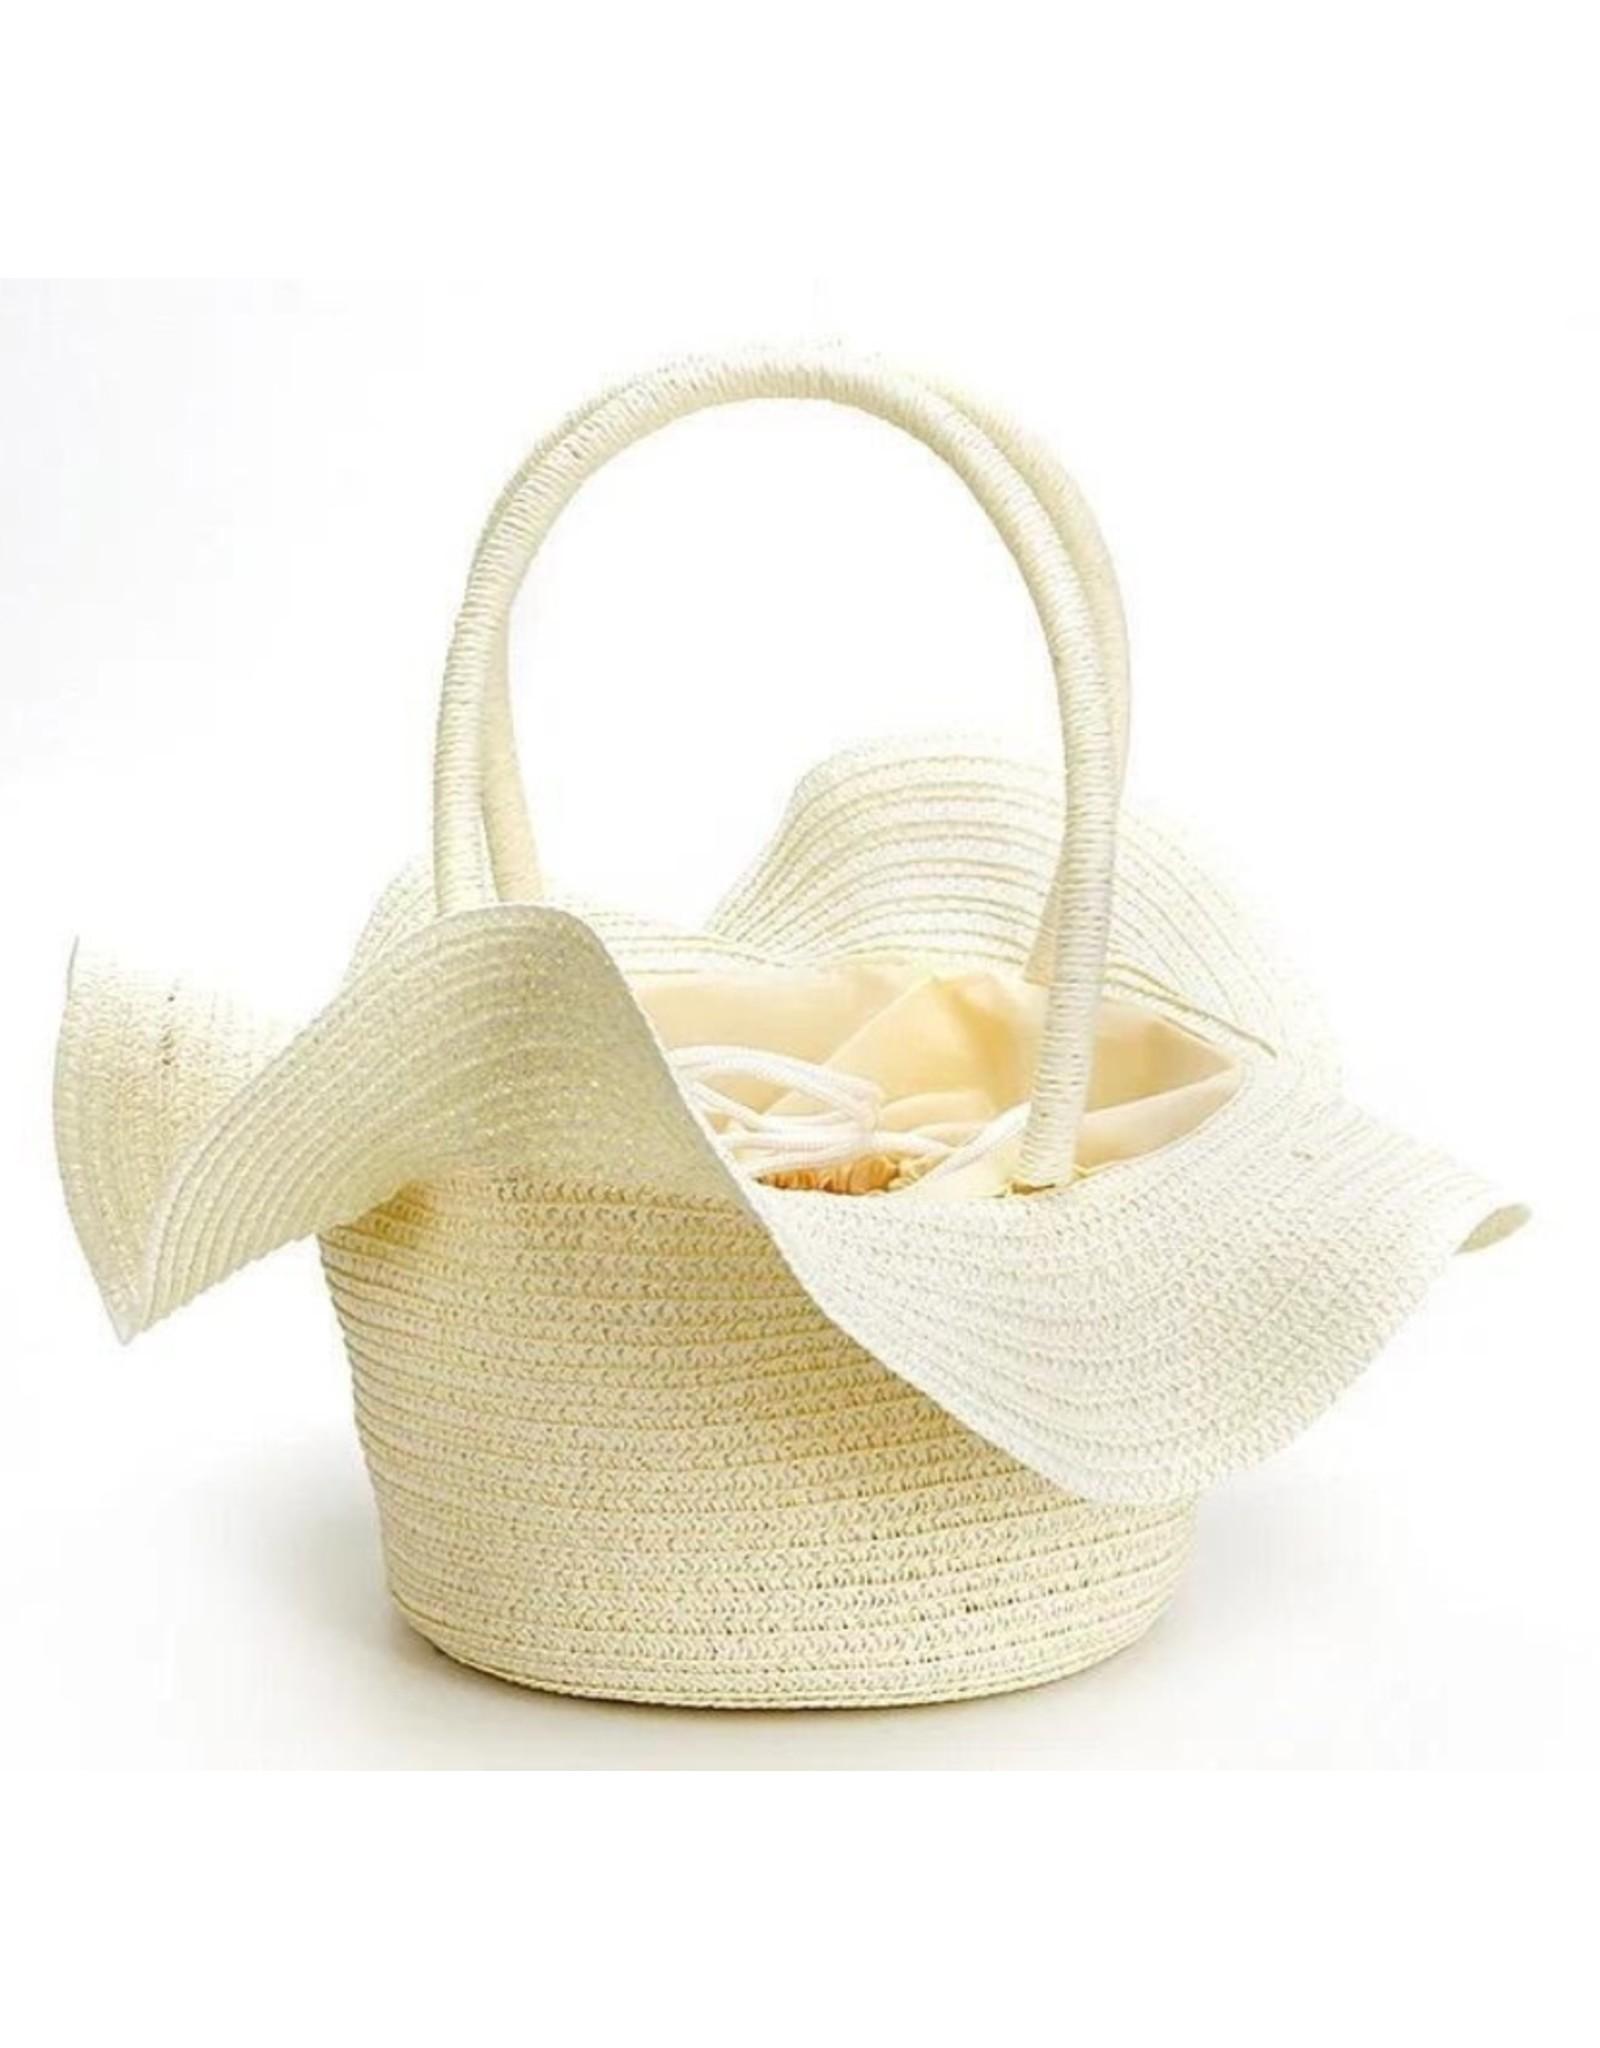 Fantasy bags and wallets - Fantasy handbag Hat